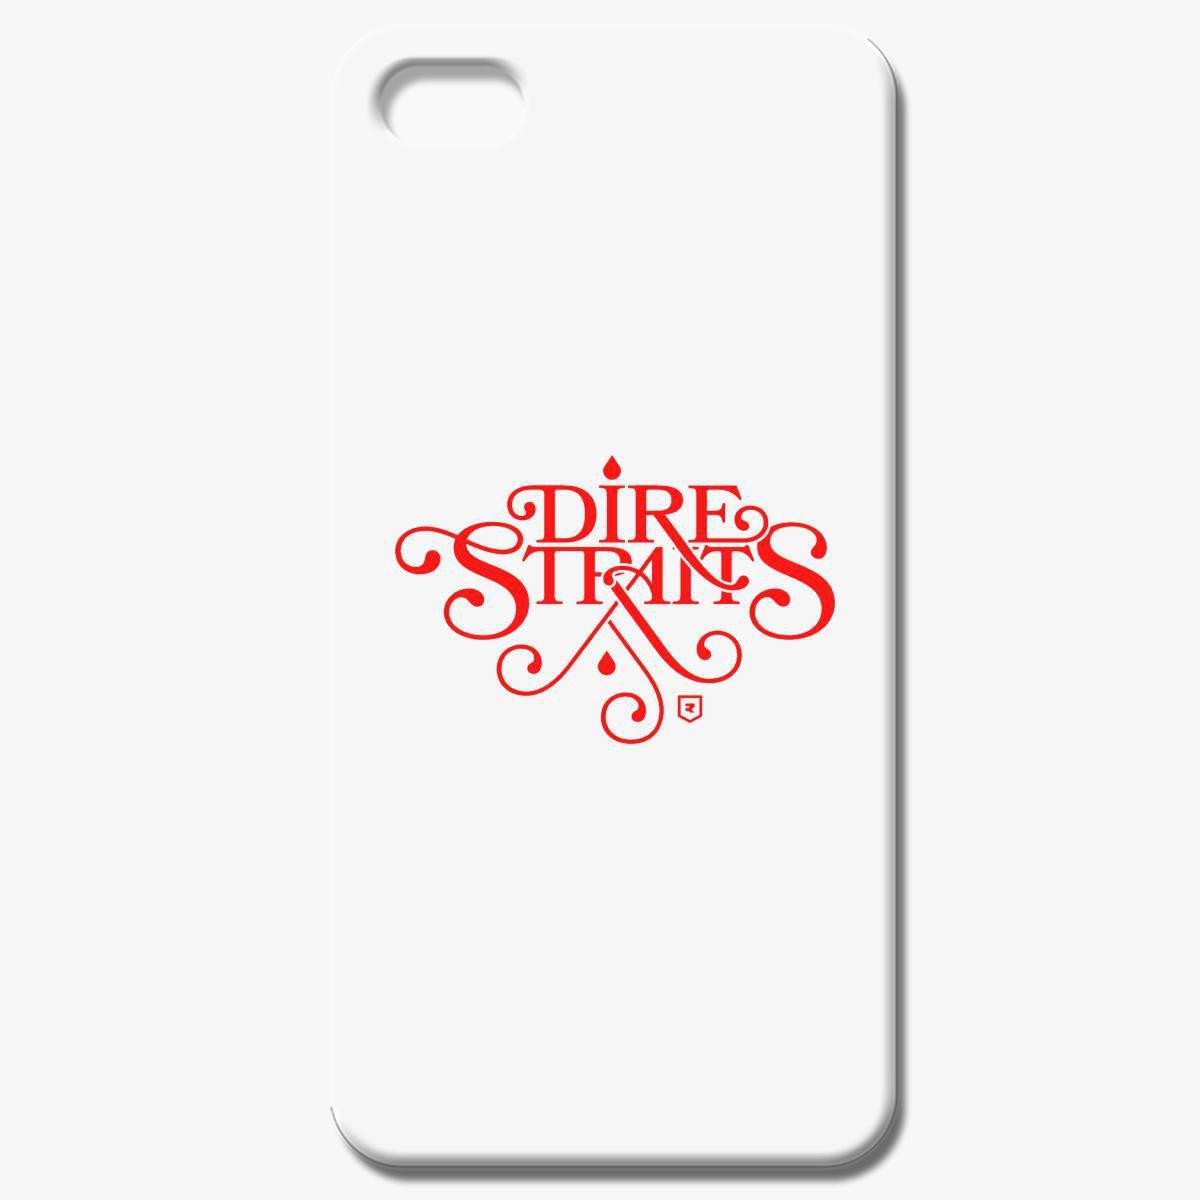 Dire Straits Logo Iphone 7 Case